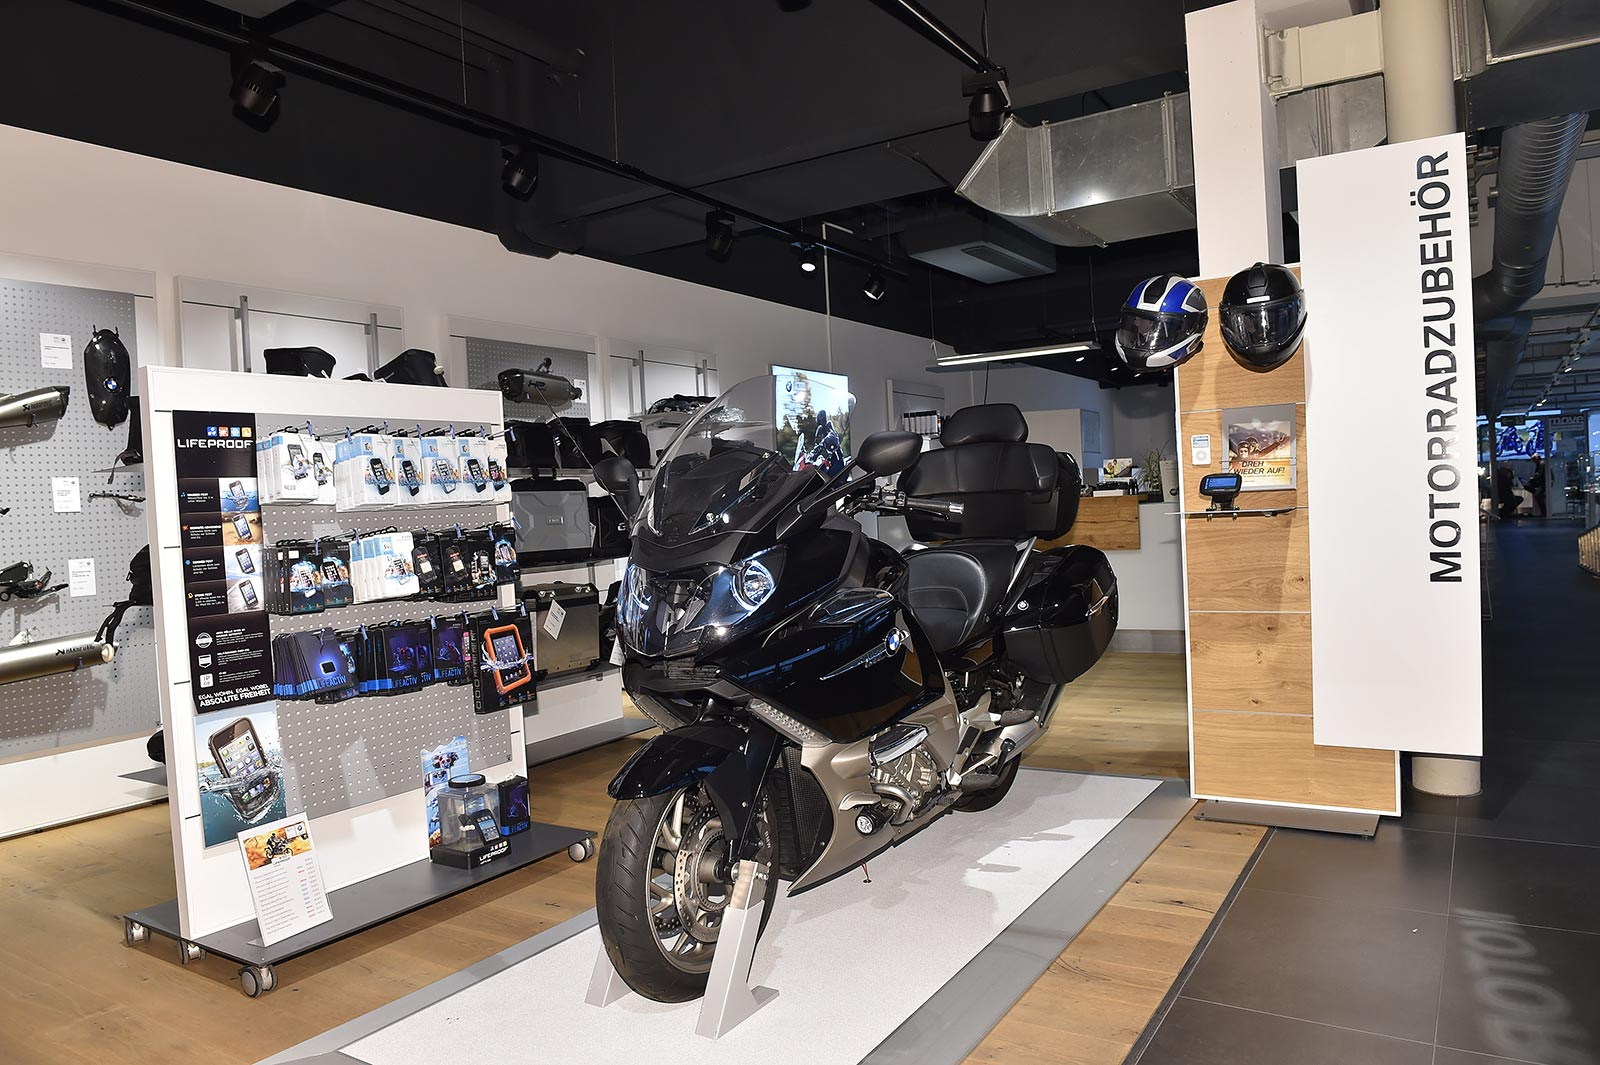 Bmw Motorrad Zentrum Düsseldorf Motorrad Bild Idee